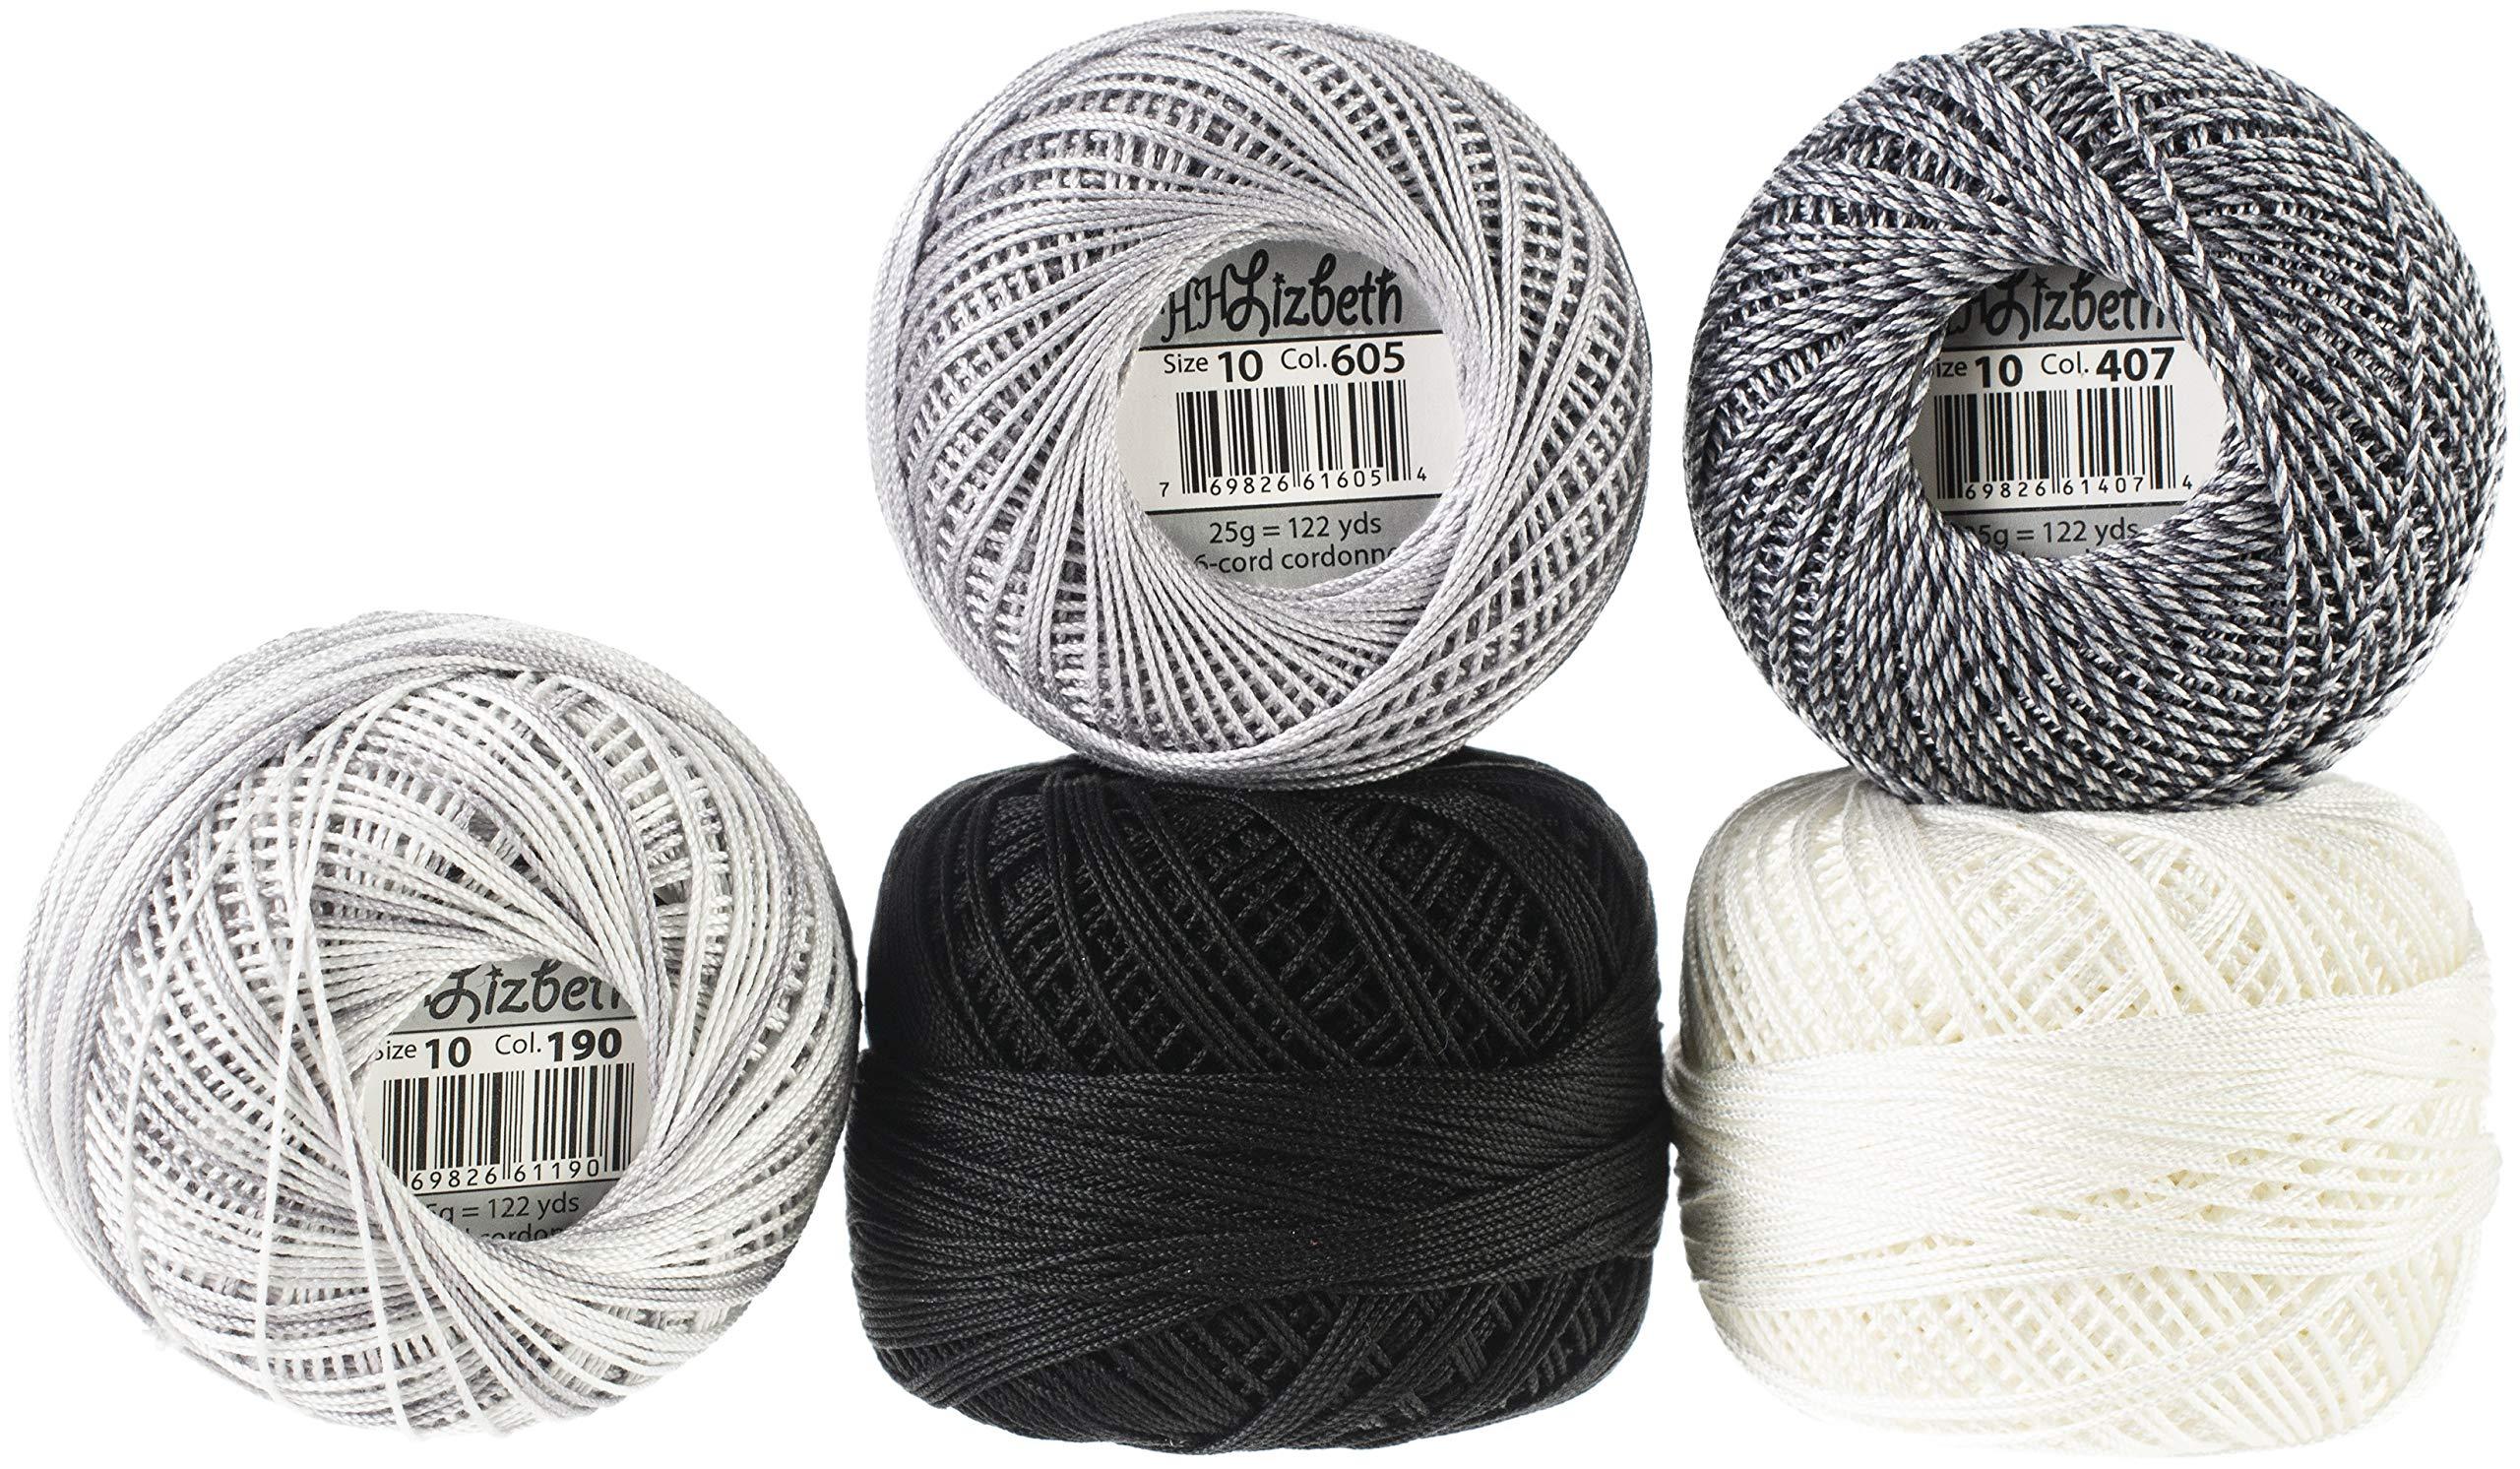 Handy Hands Lizbeth Specialty Pack Cordonnet Cotton Size 10-silver Clouds 5/pkg by Handy Hands (Image #1)